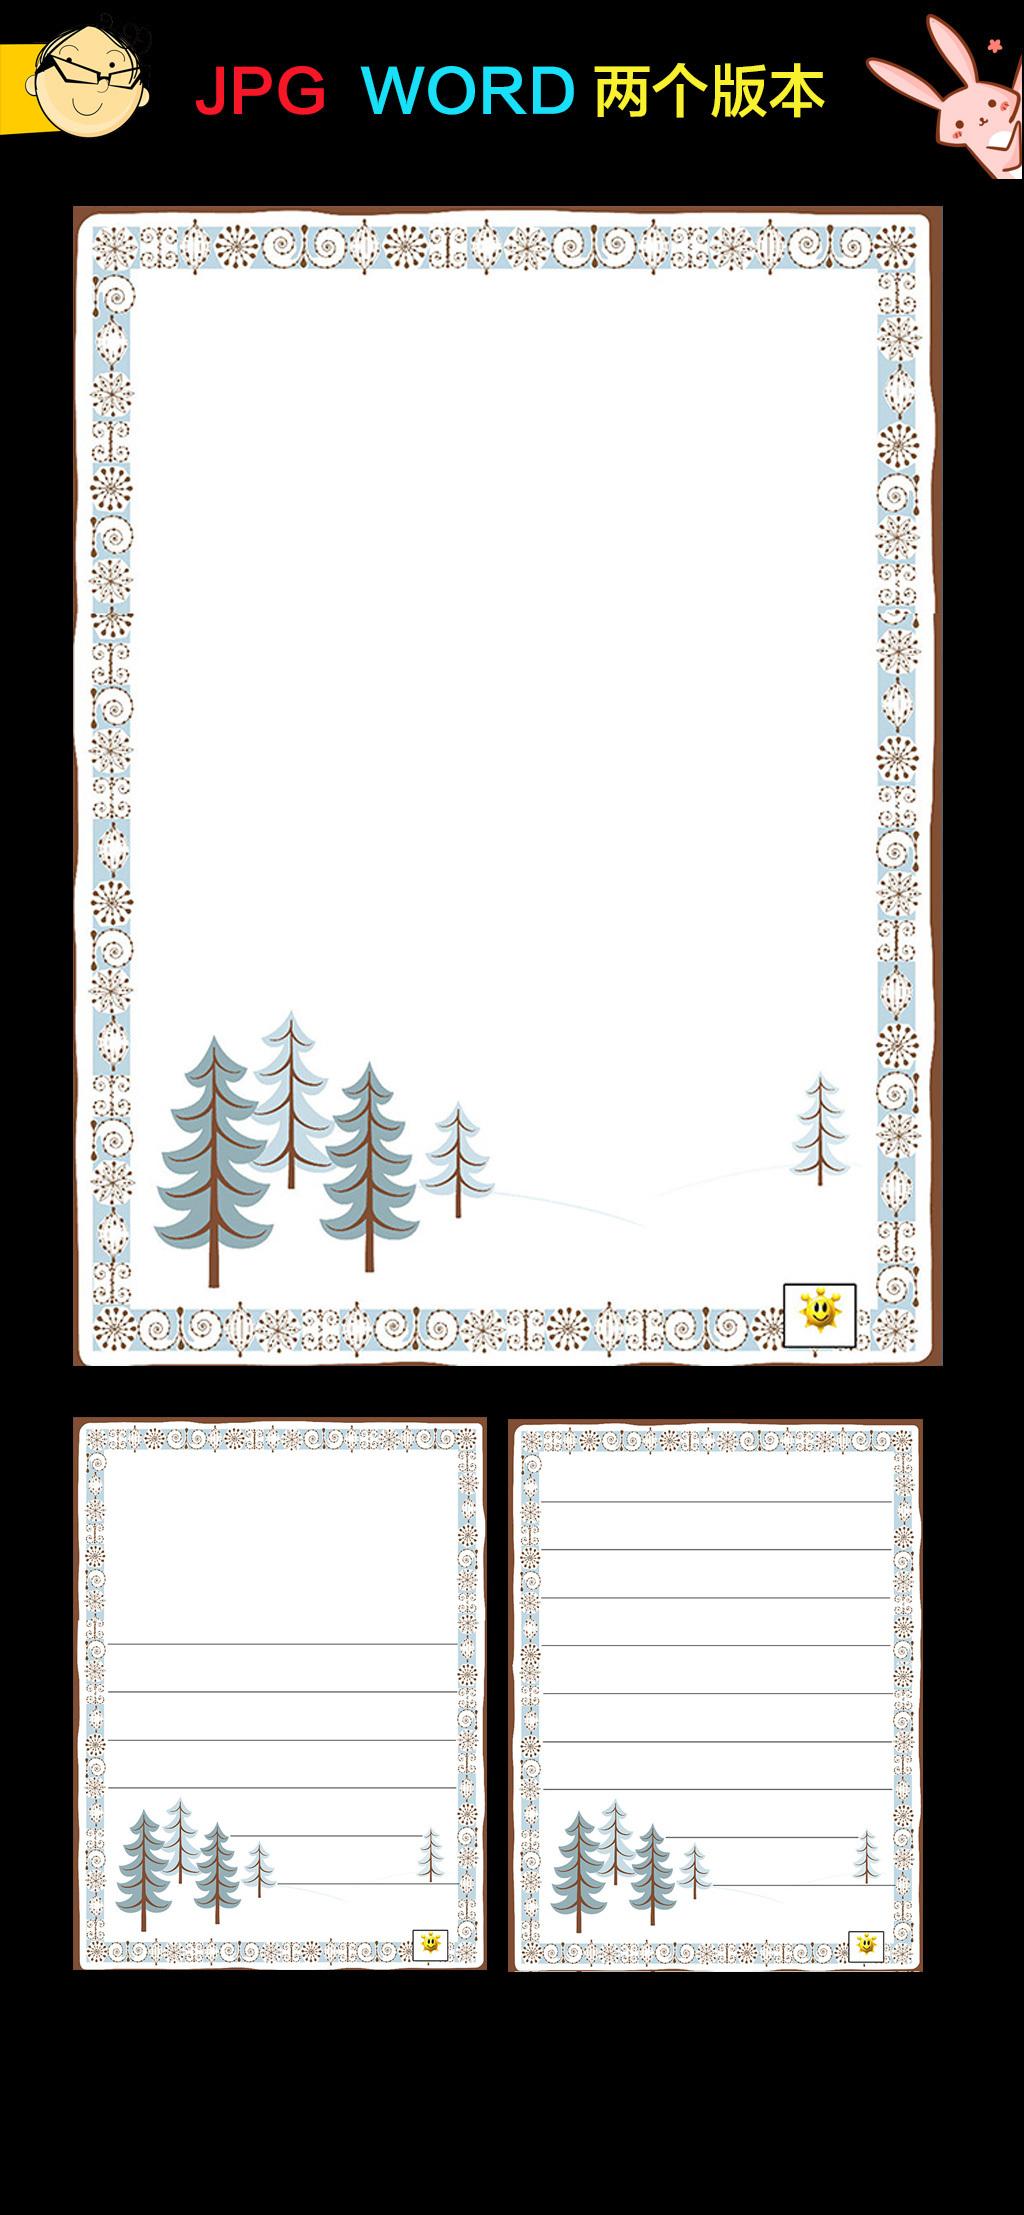 ppt 背景 背景图片 边框 模板 设计 相框 1024_2215 竖版 竖屏